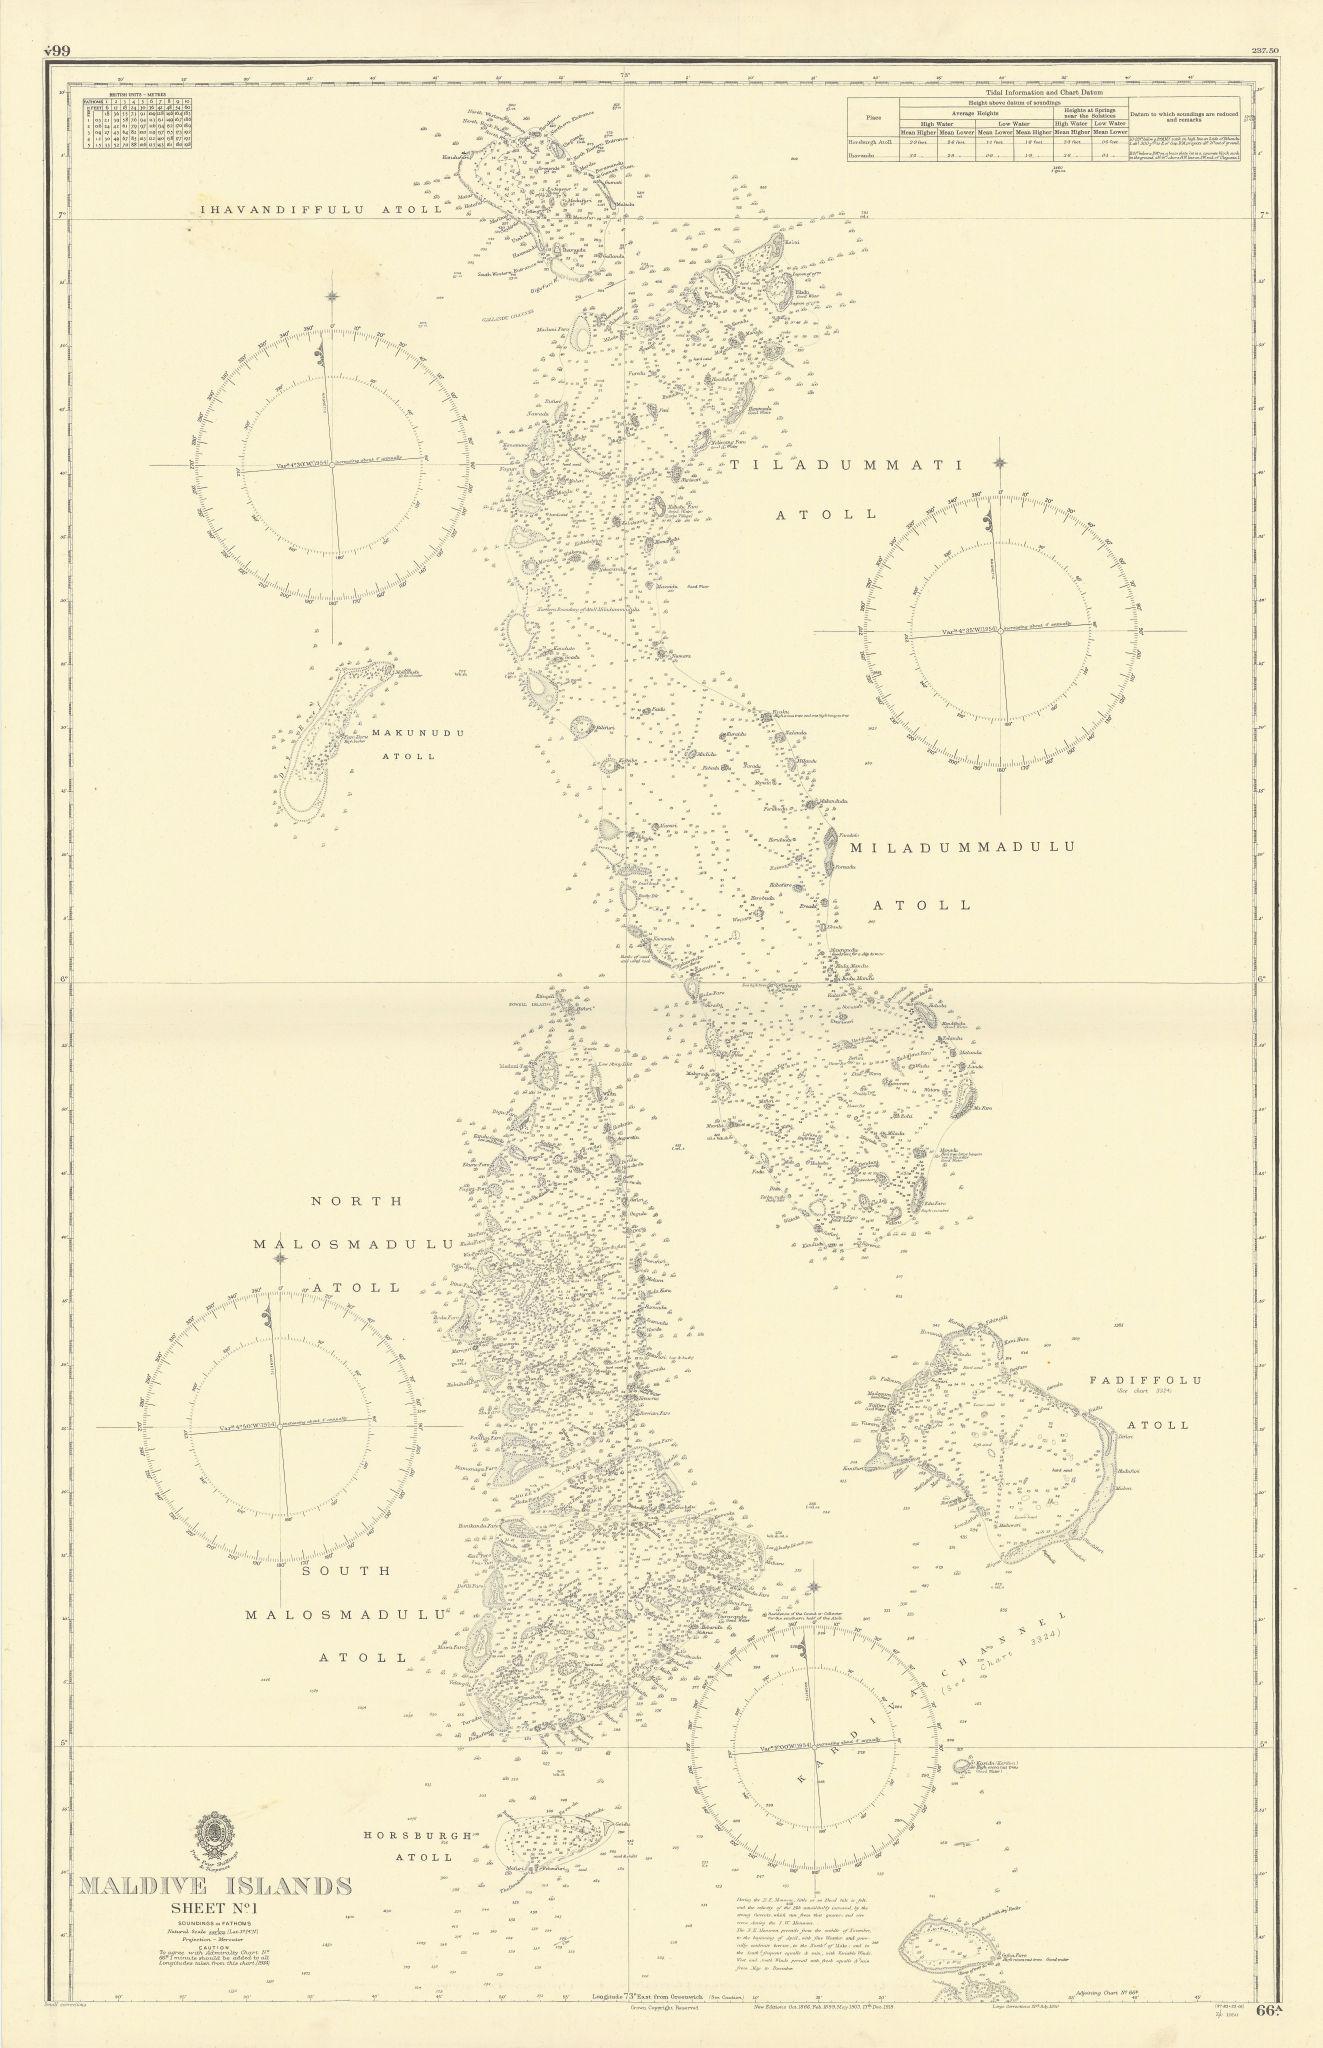 Maldive Islands #1 North Walker/EAST INDIA COMPANY sea chart 1839 (1950) map